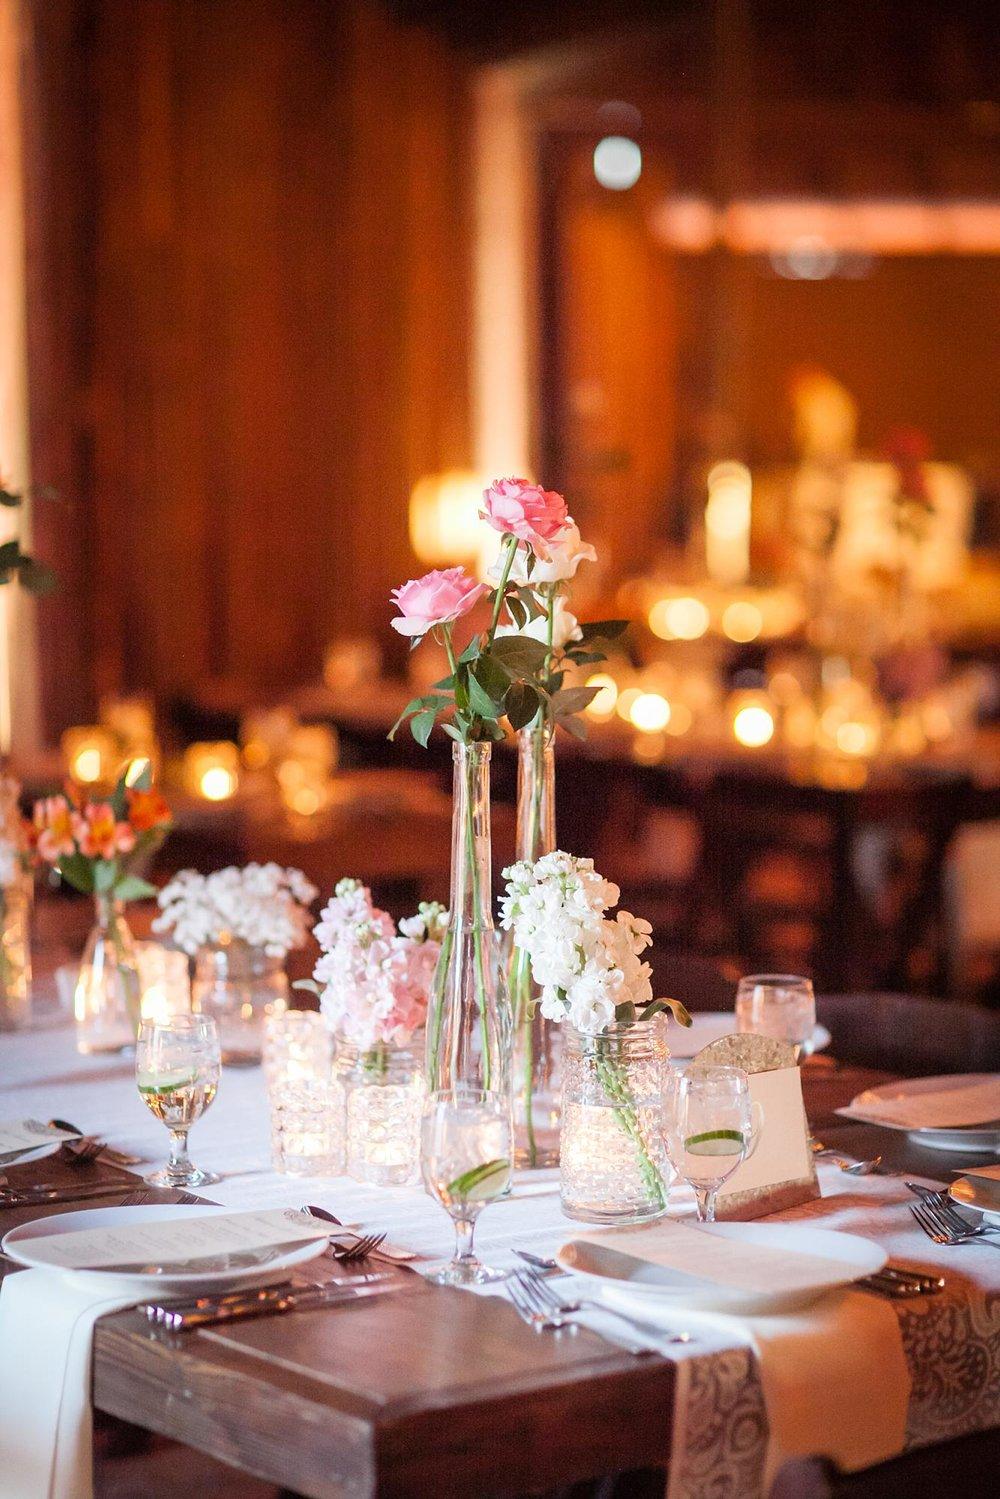 Scottsdale Wedding | Miki & Sonja Photography | mikiandsonja.com